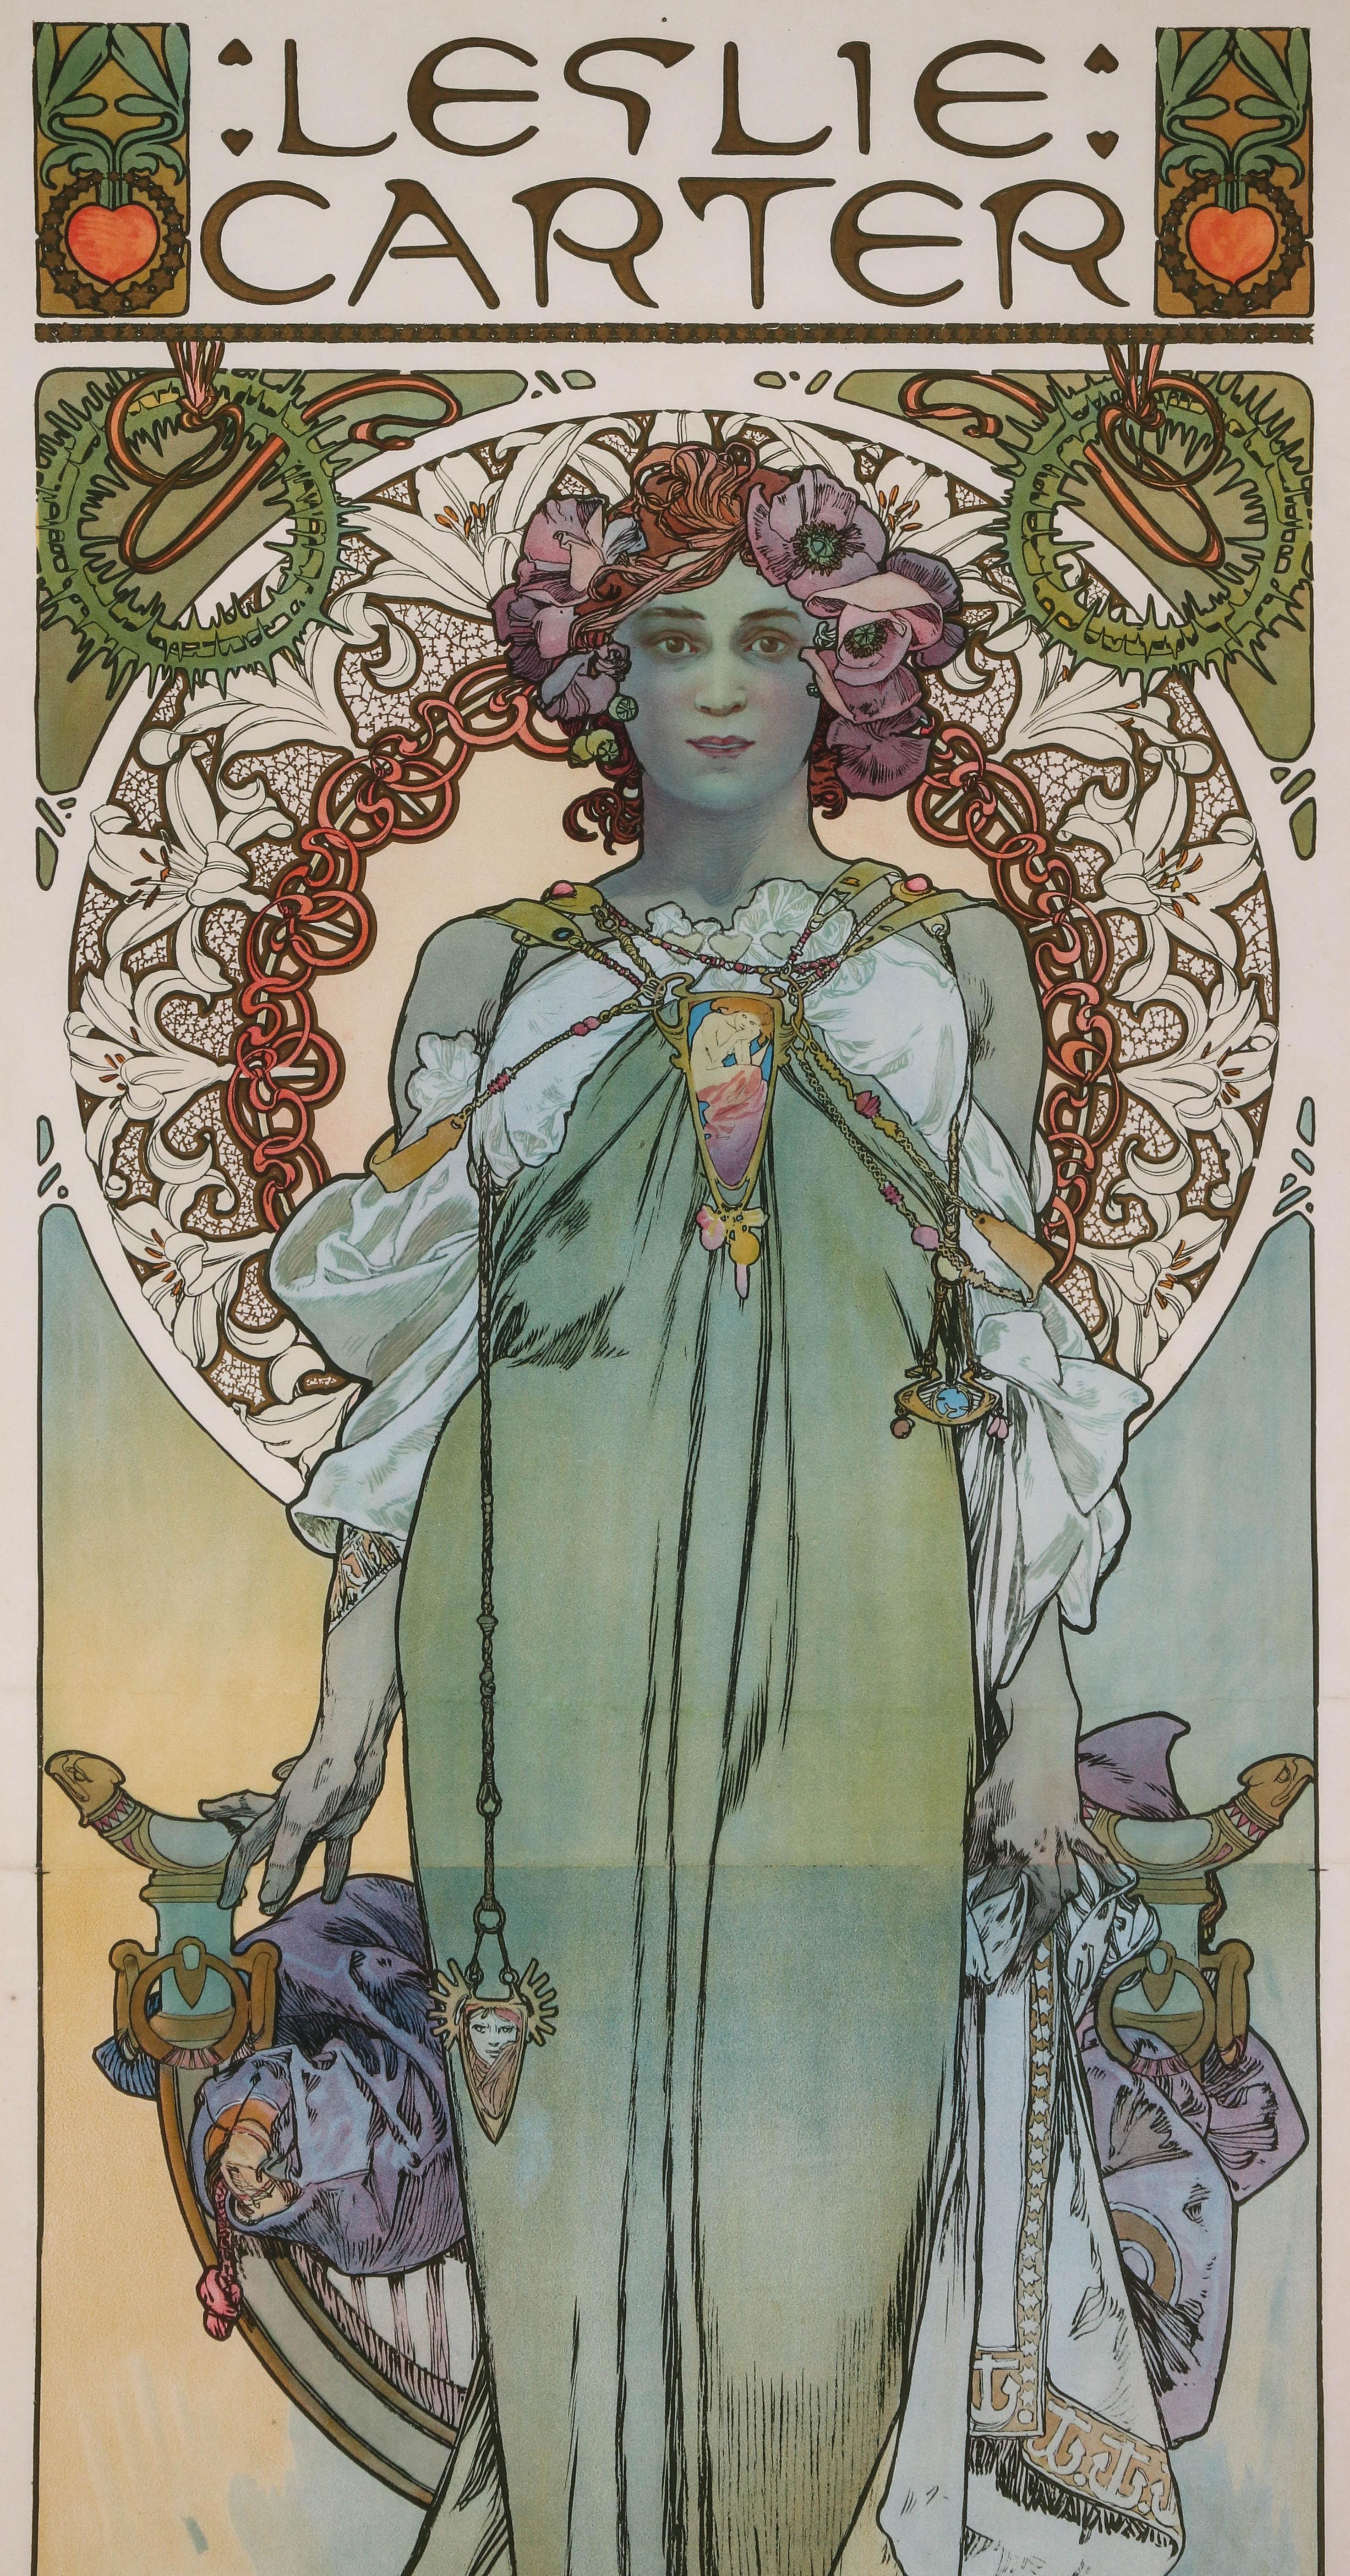 Alphonse Mucha. Poster: Leslie Carter